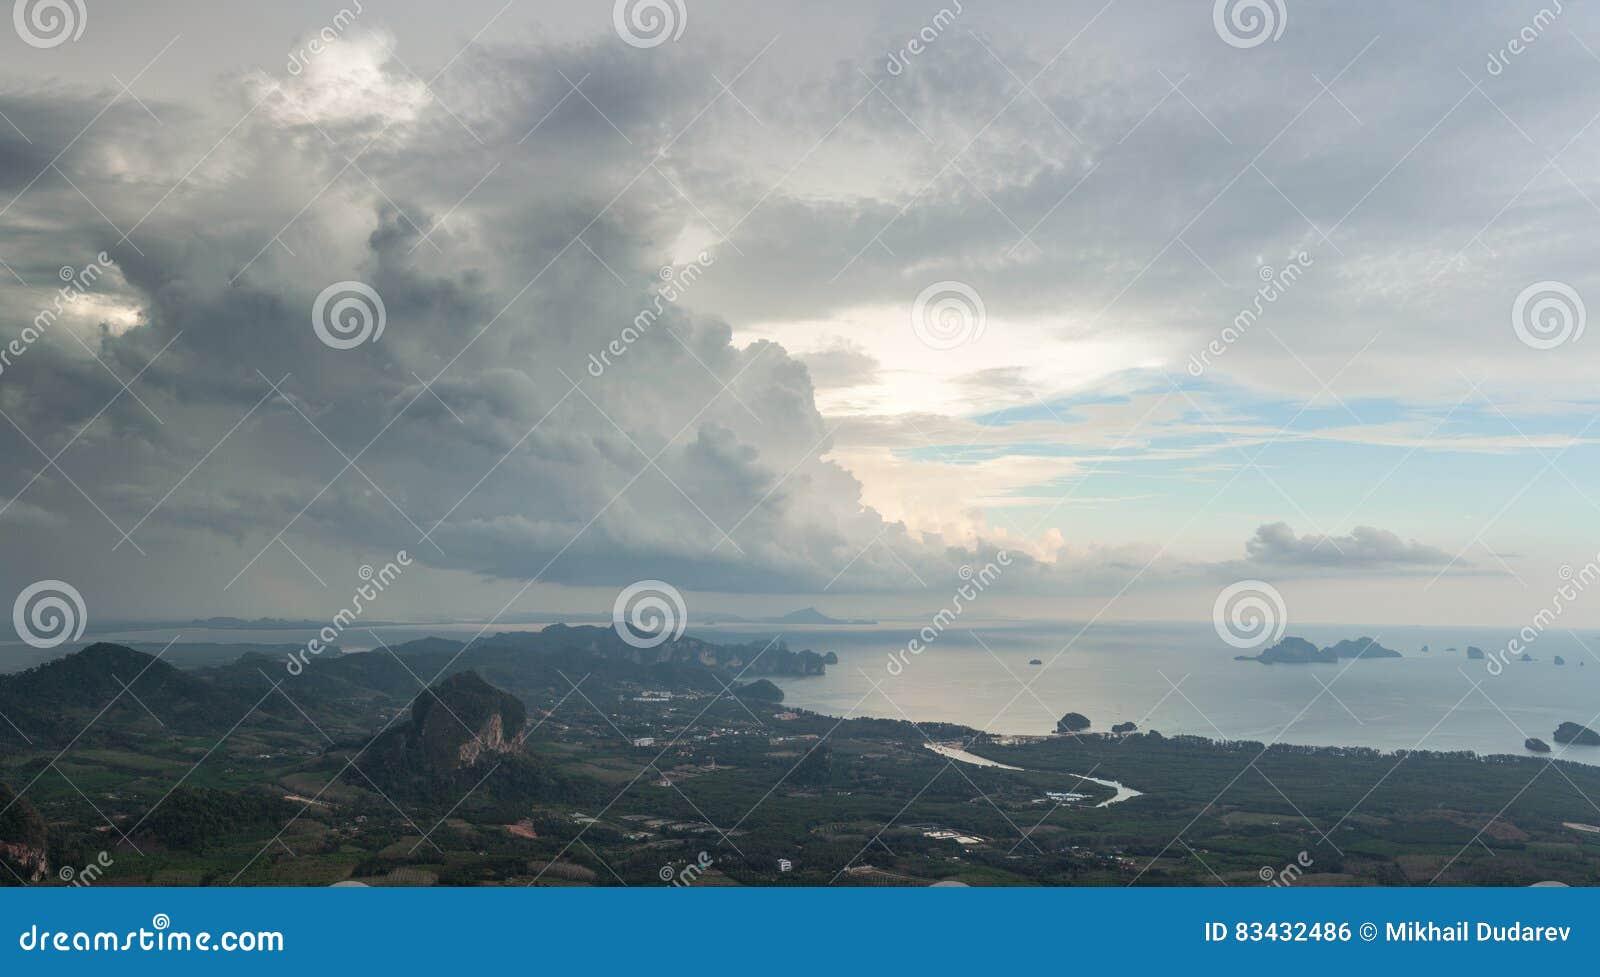 mountains sky light clouds - photo #43